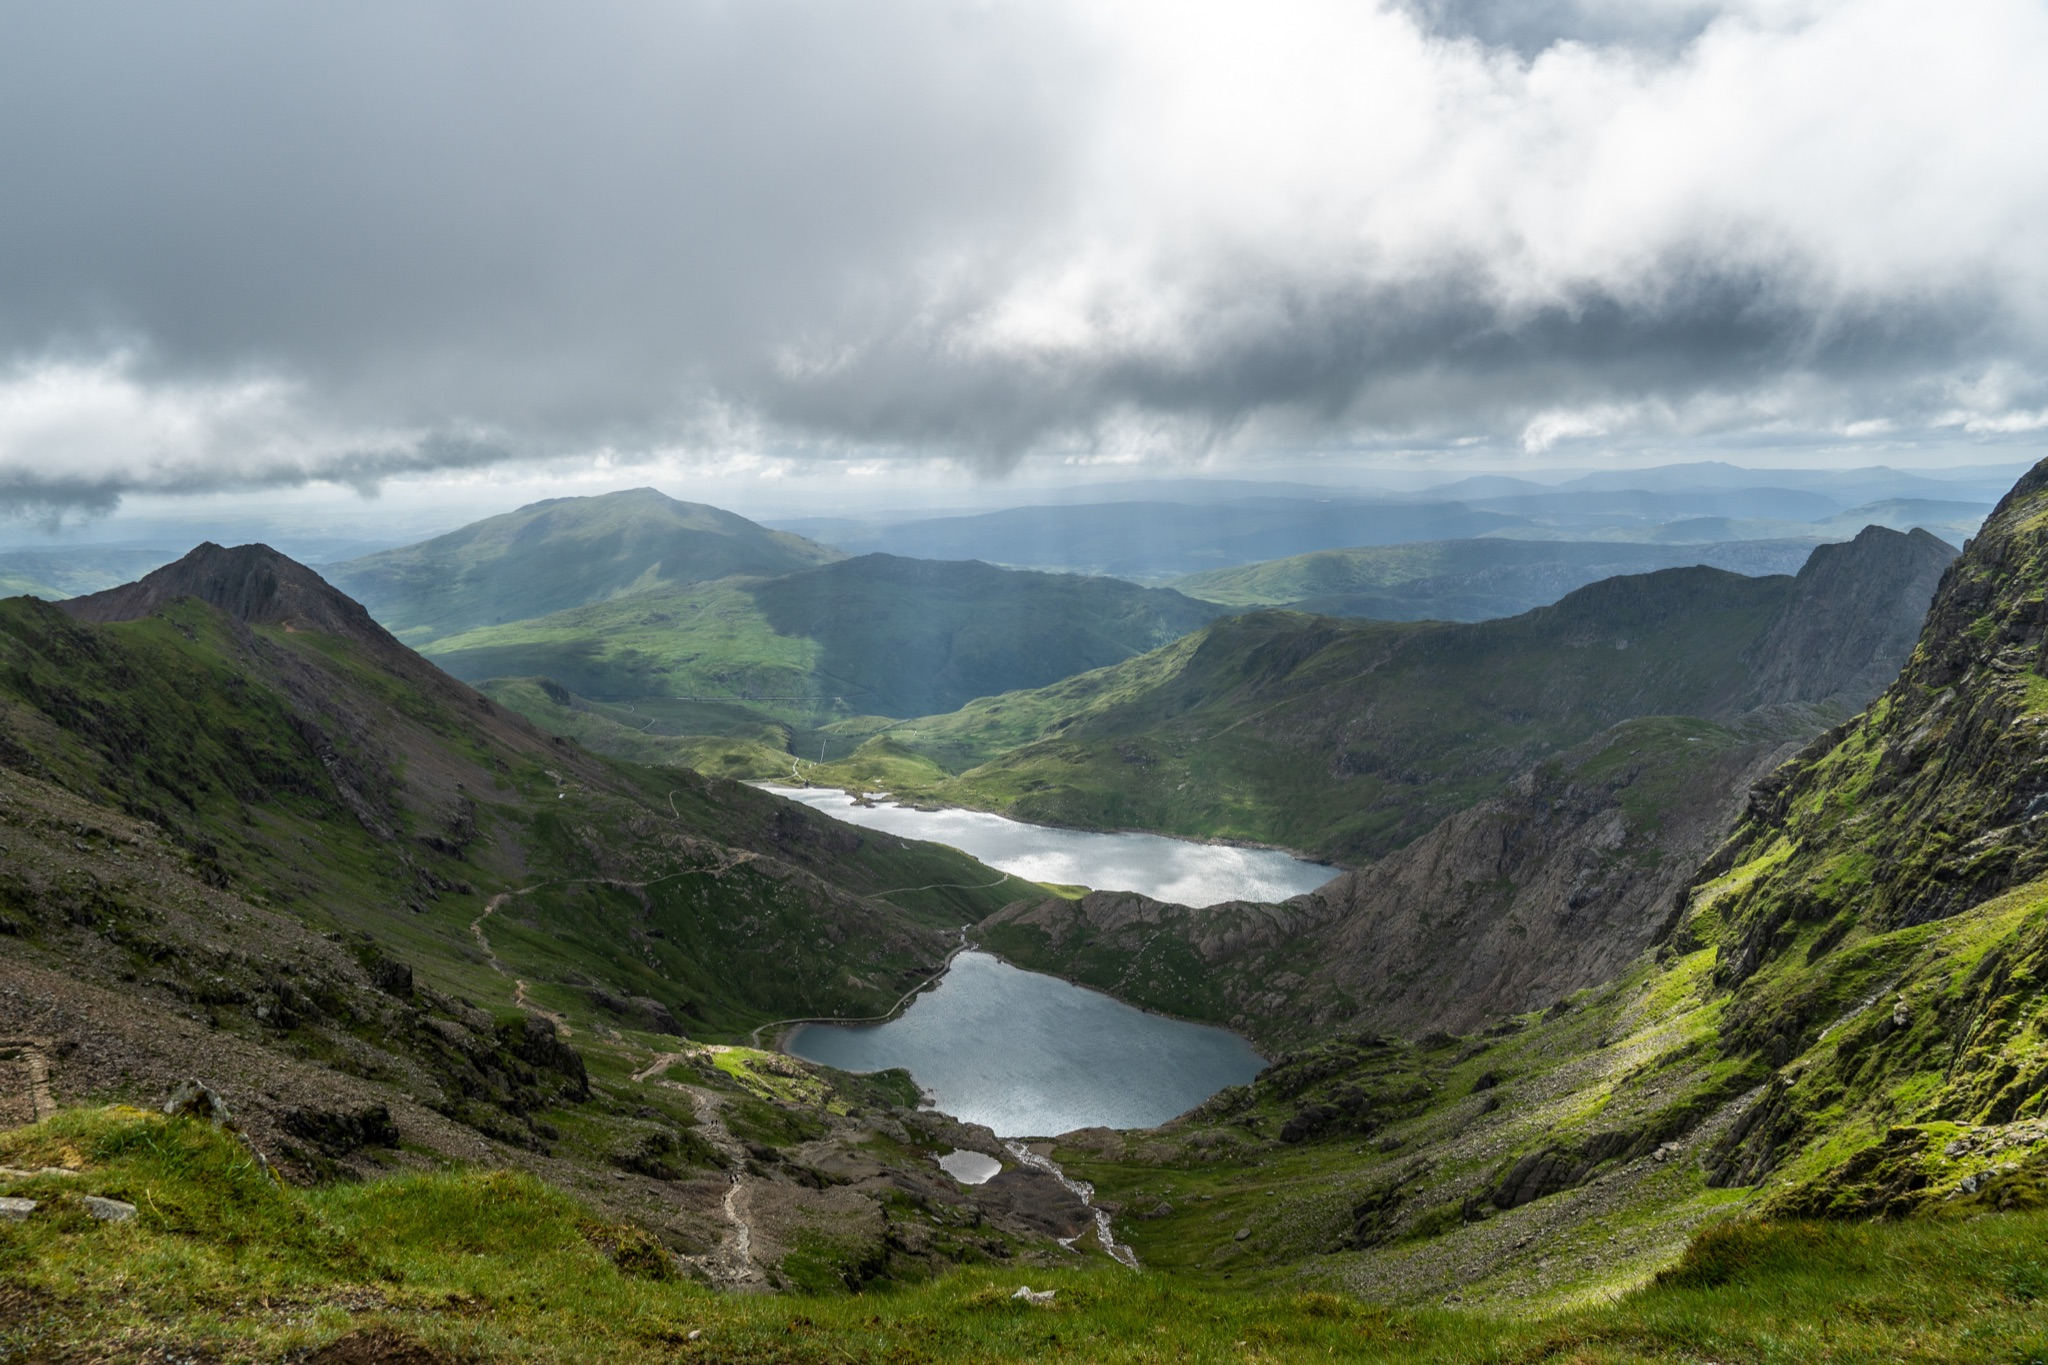 Tallest mountain in Wales